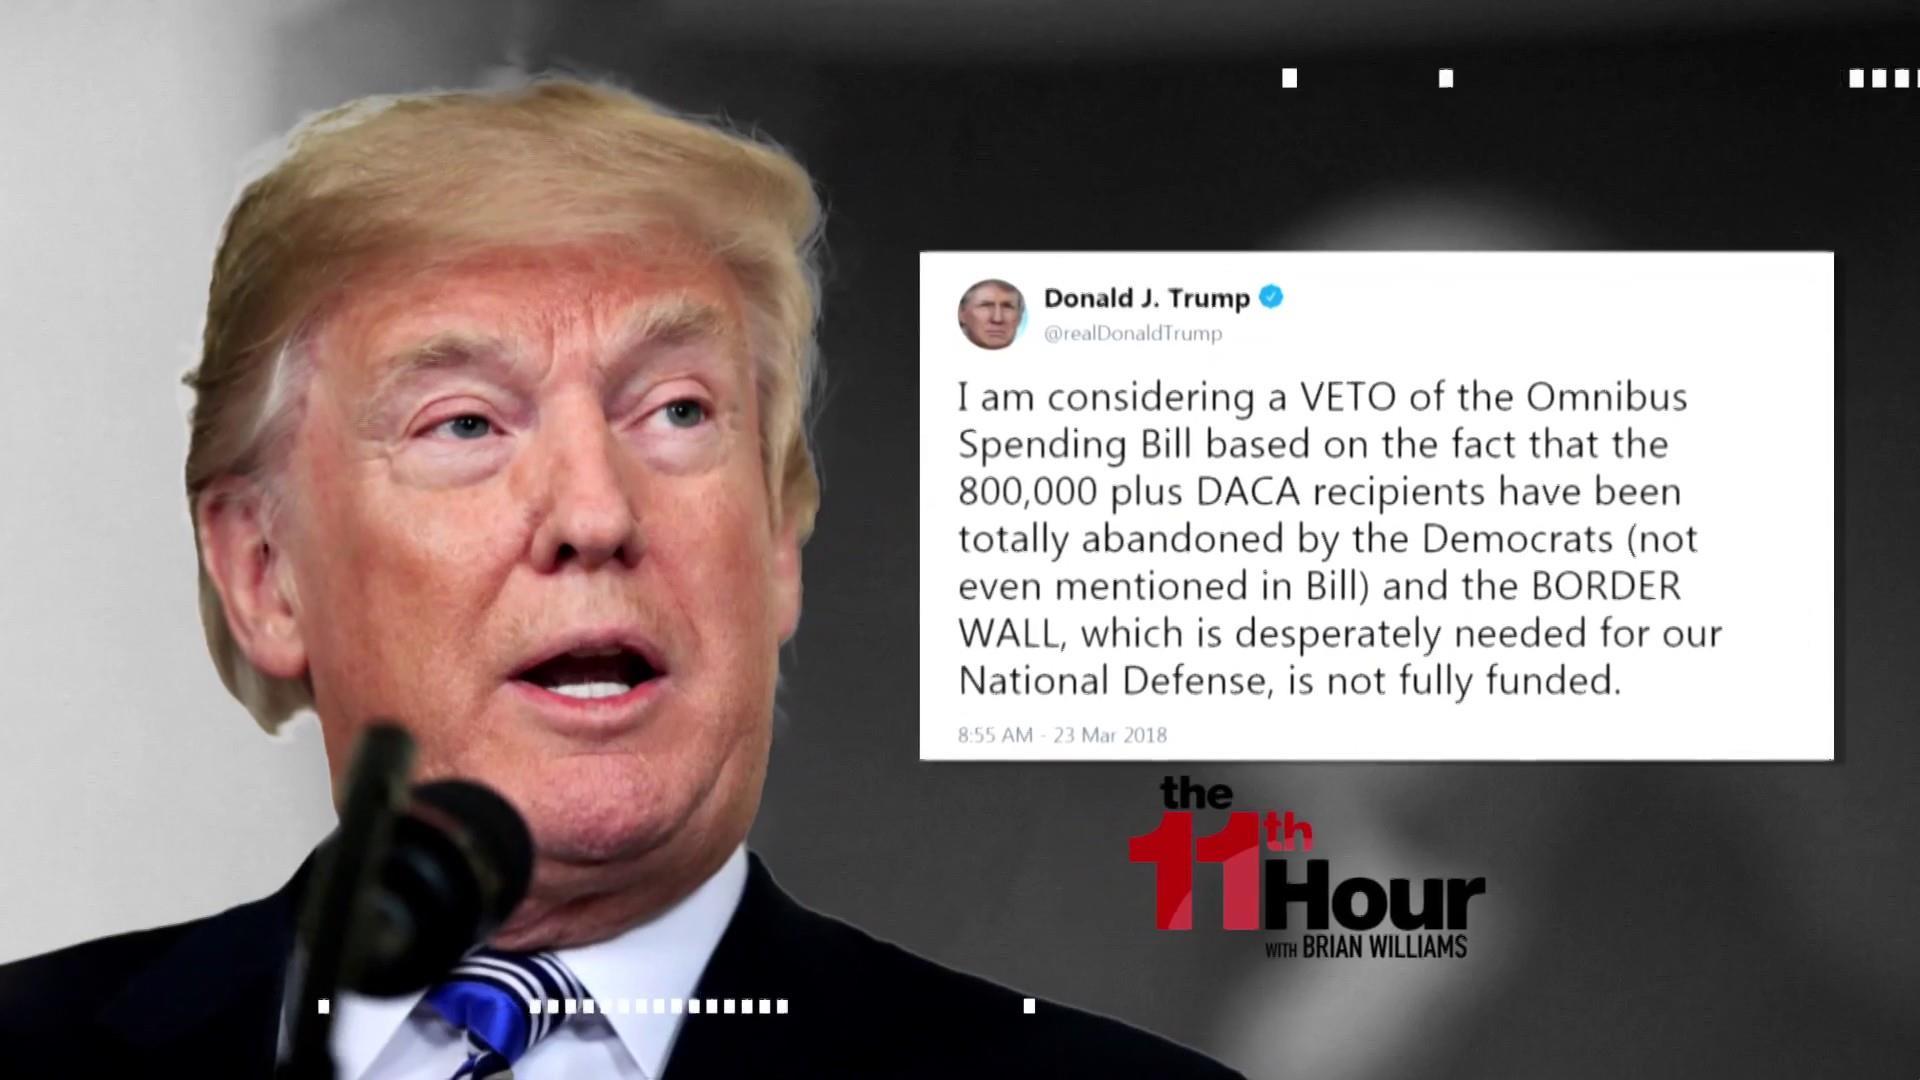 Trump's Volatile Week Almost Ends in Shutdown